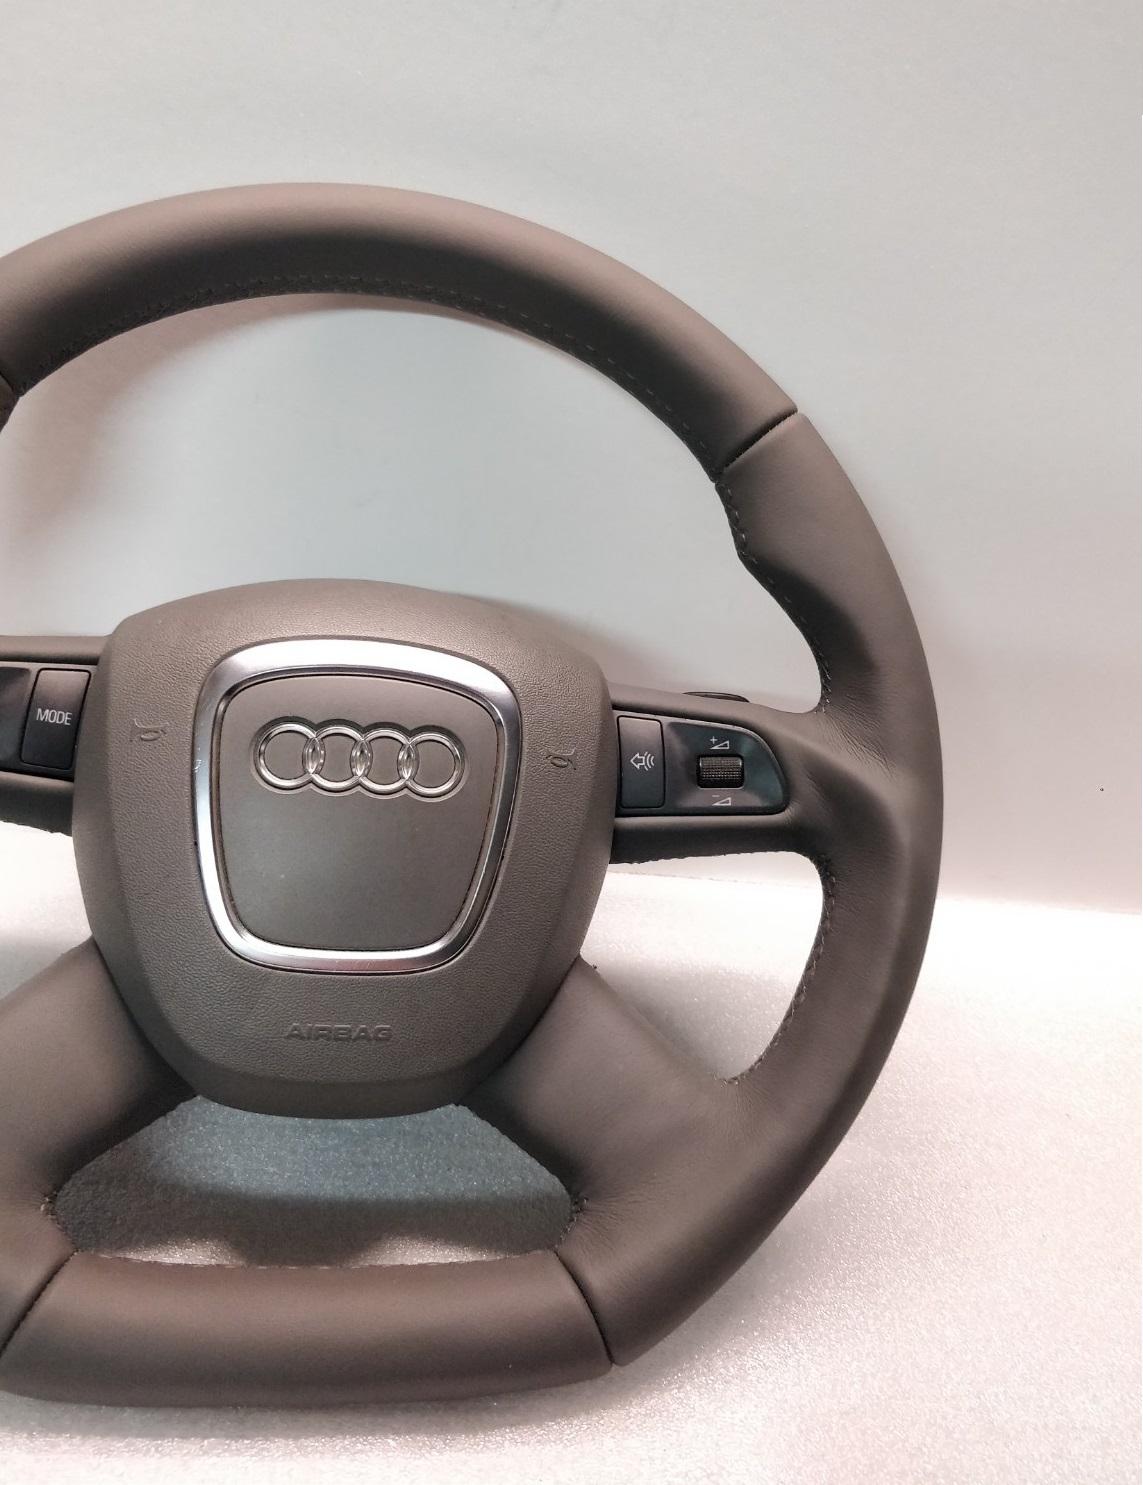 Audi A6 C6 A4 B7 A8 Q7 Steering Wheel Flat Grey Leather Custom Tiptronic Evolution Gt